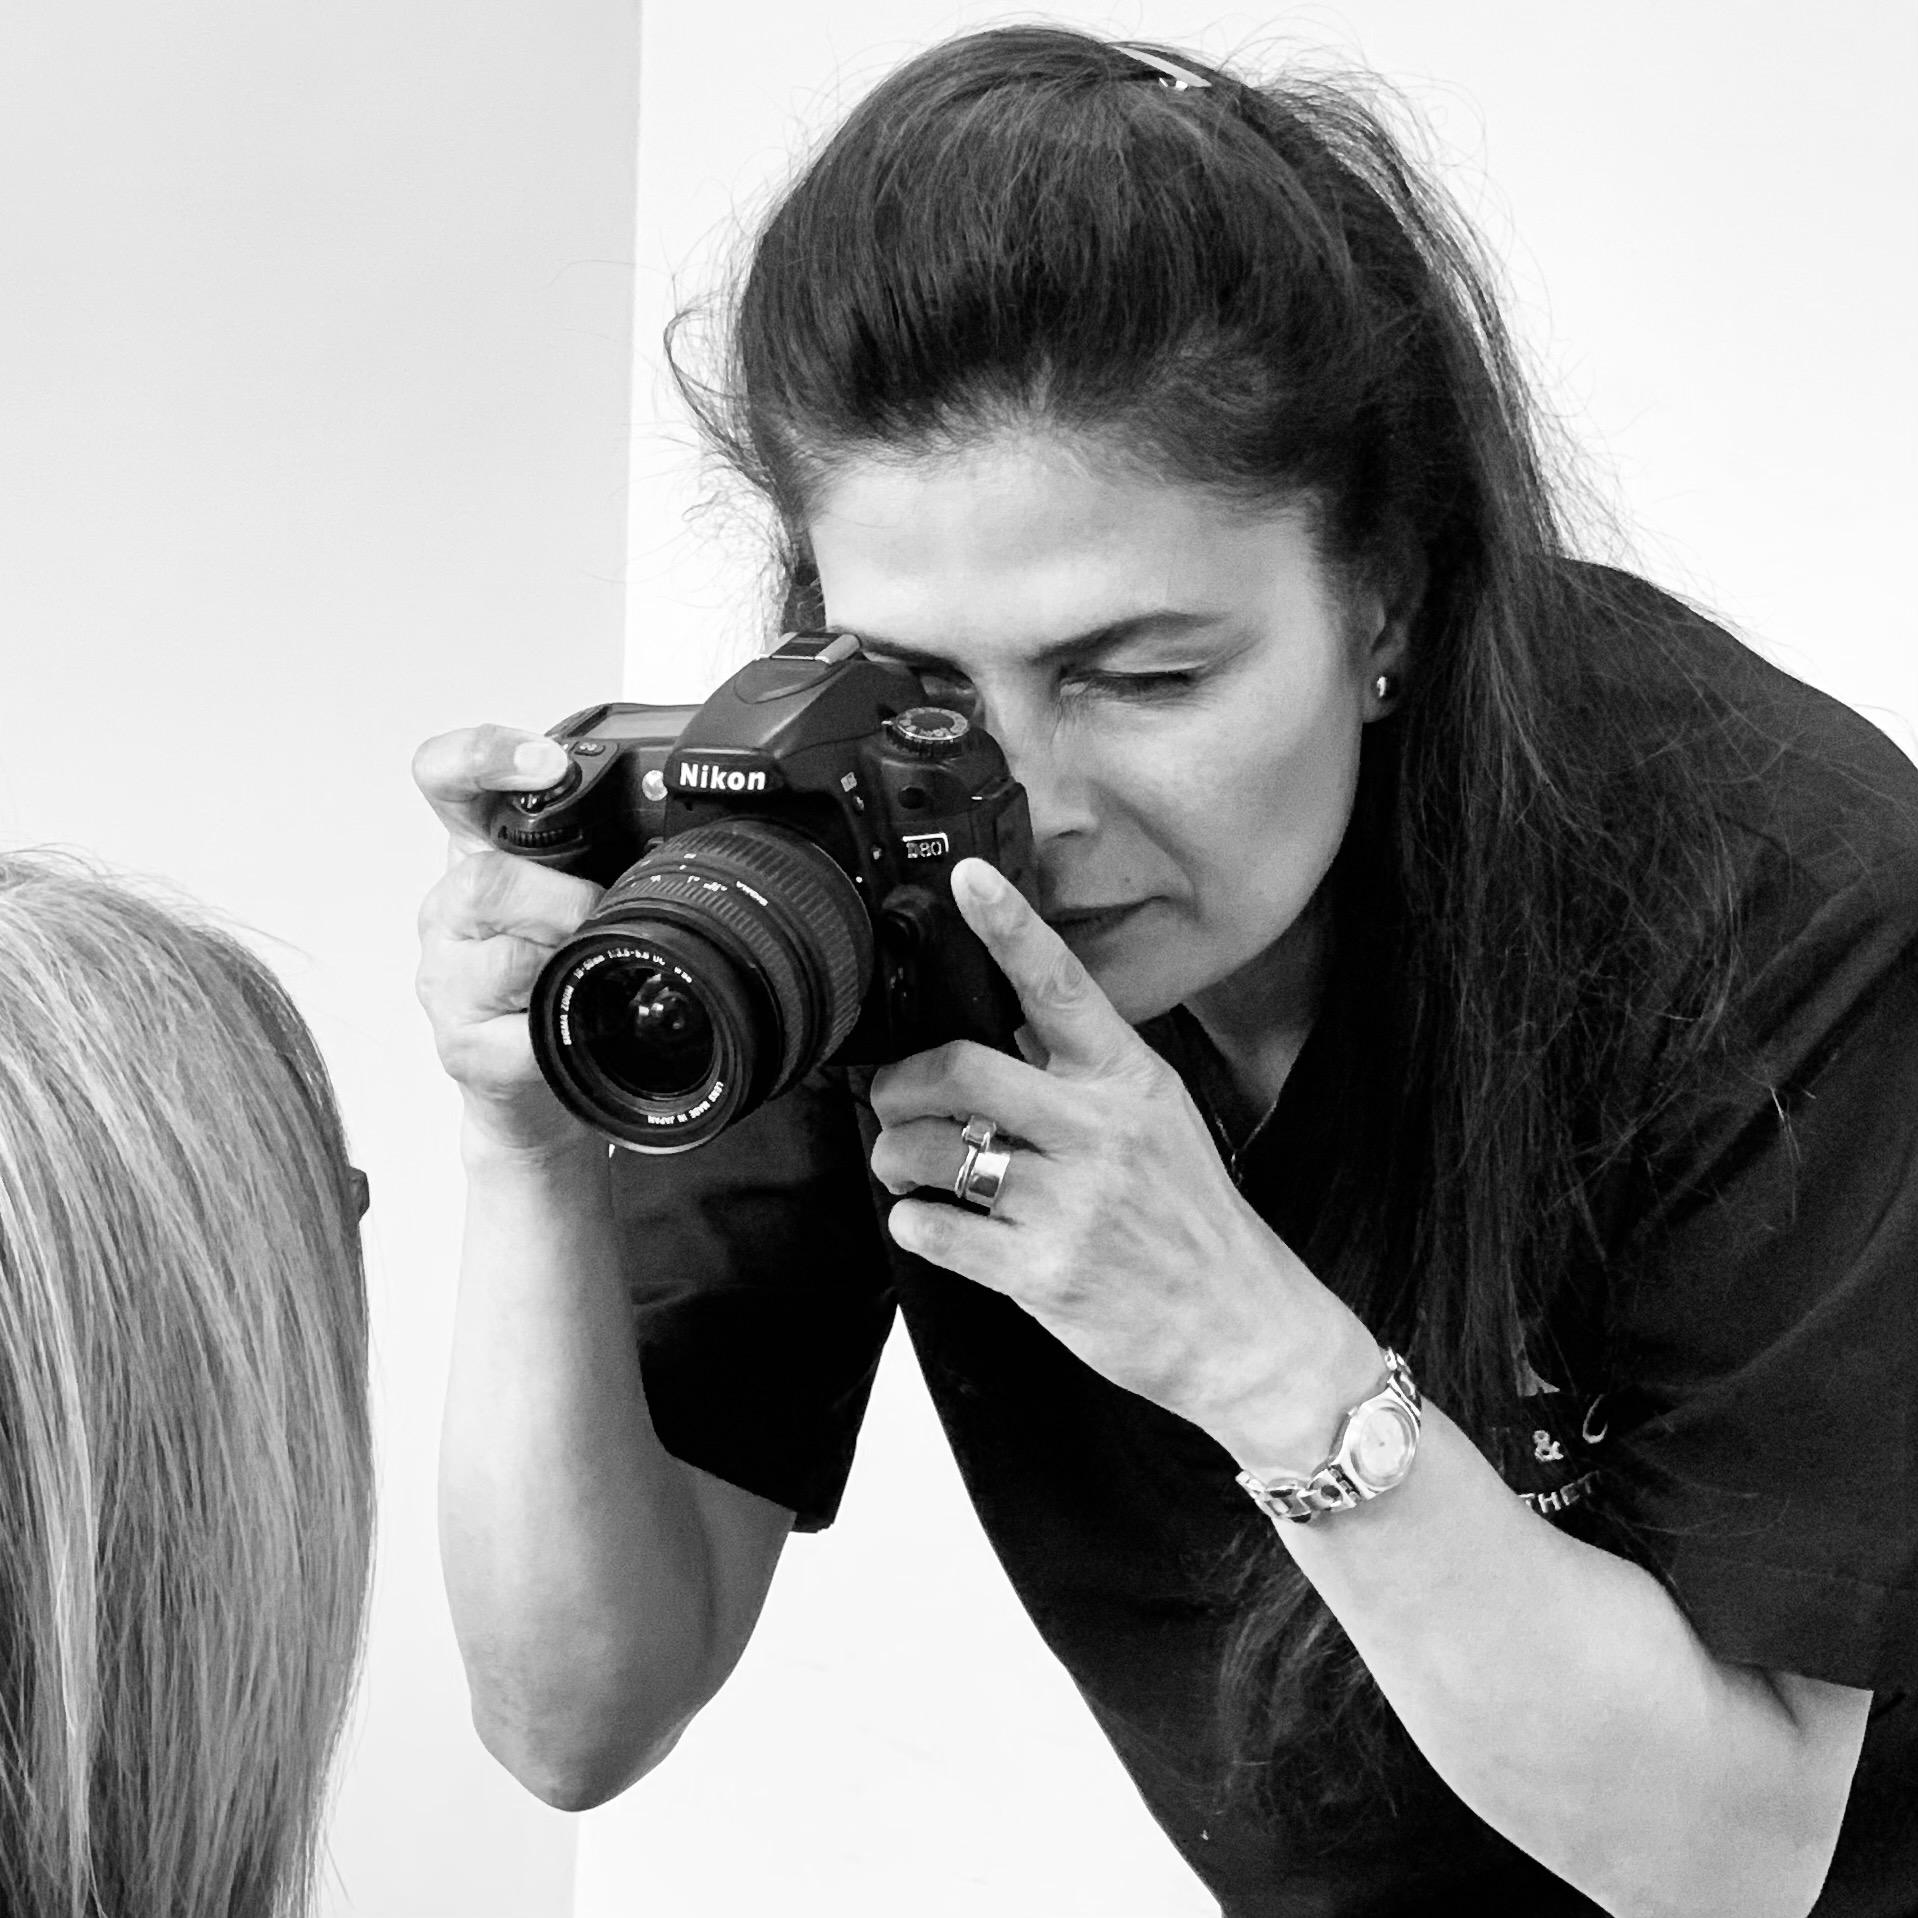 Shobhna Smile Photography